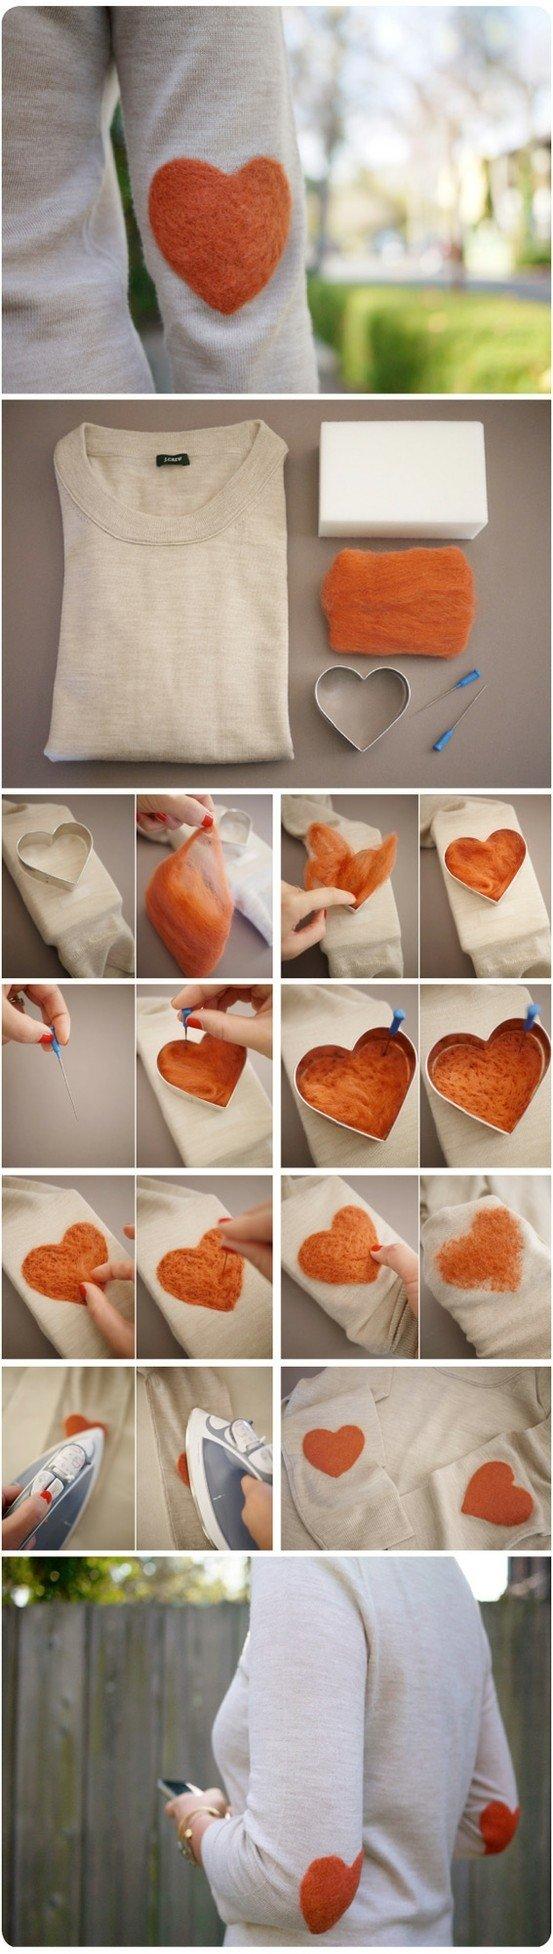 "Check out Jenna Whittaker's ""DIY heart elbowpad detailing"" decalz @Lockerz http://lockerz.com/d/20087819?ref=kelly.tom2771"